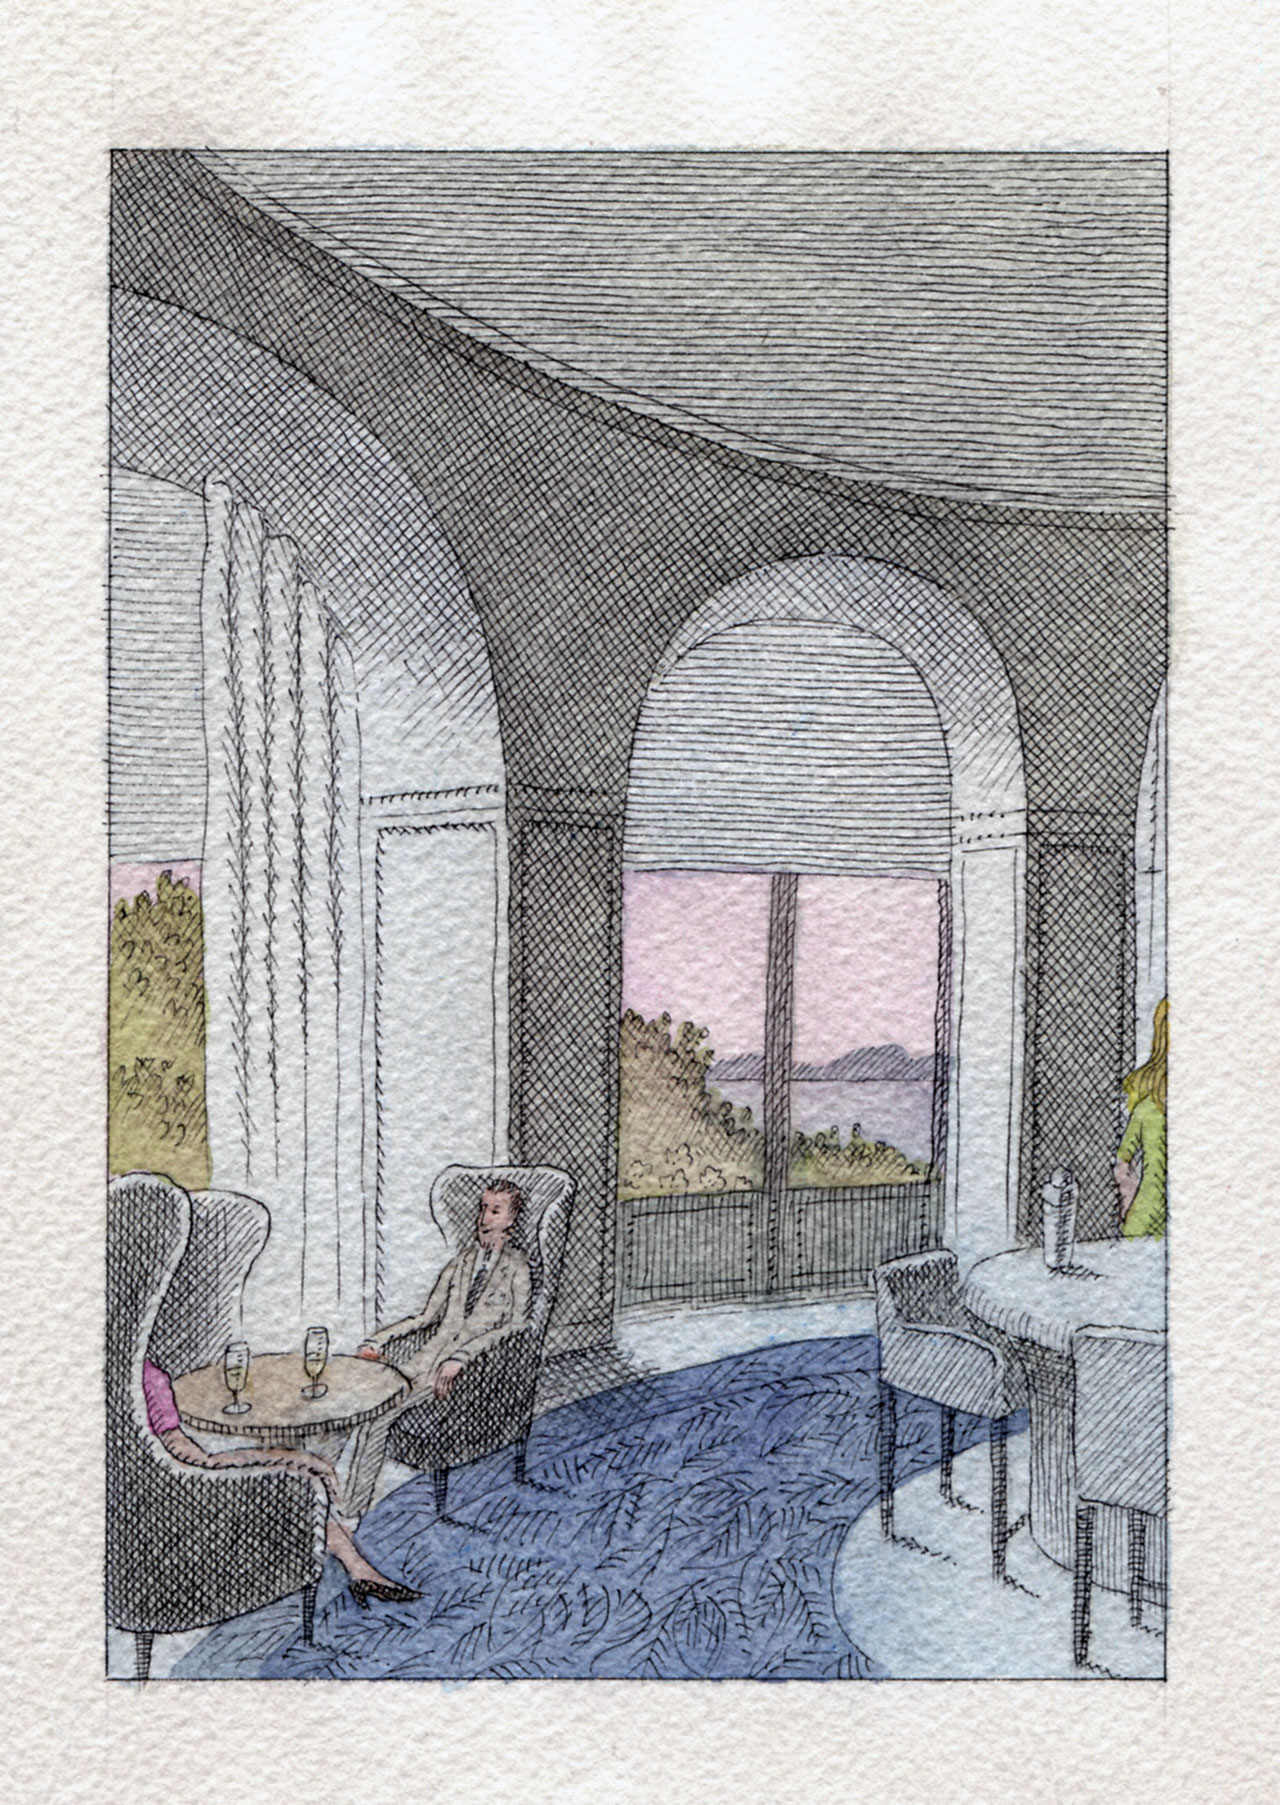 illustration byPierre Le-Tan.